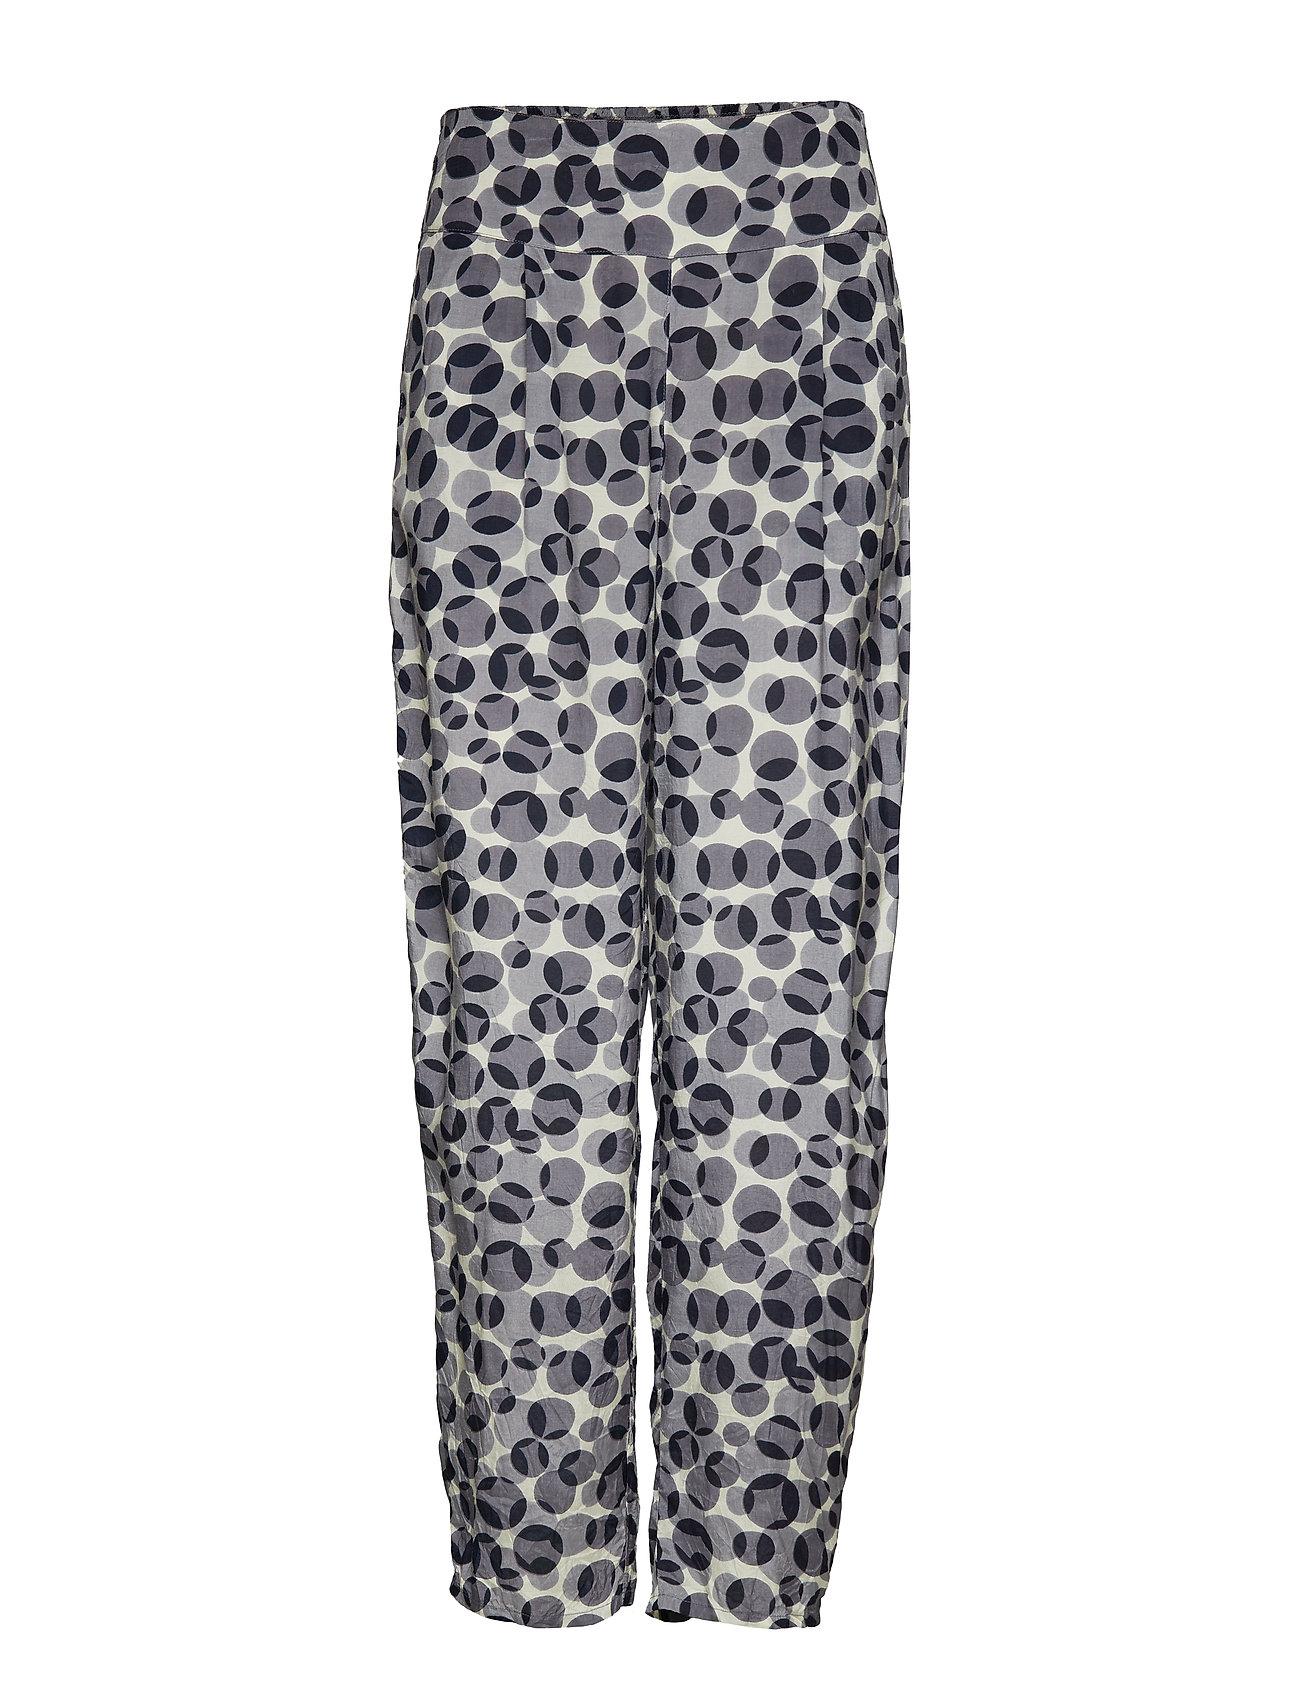 Masai Pai trousers - FLINT ORG